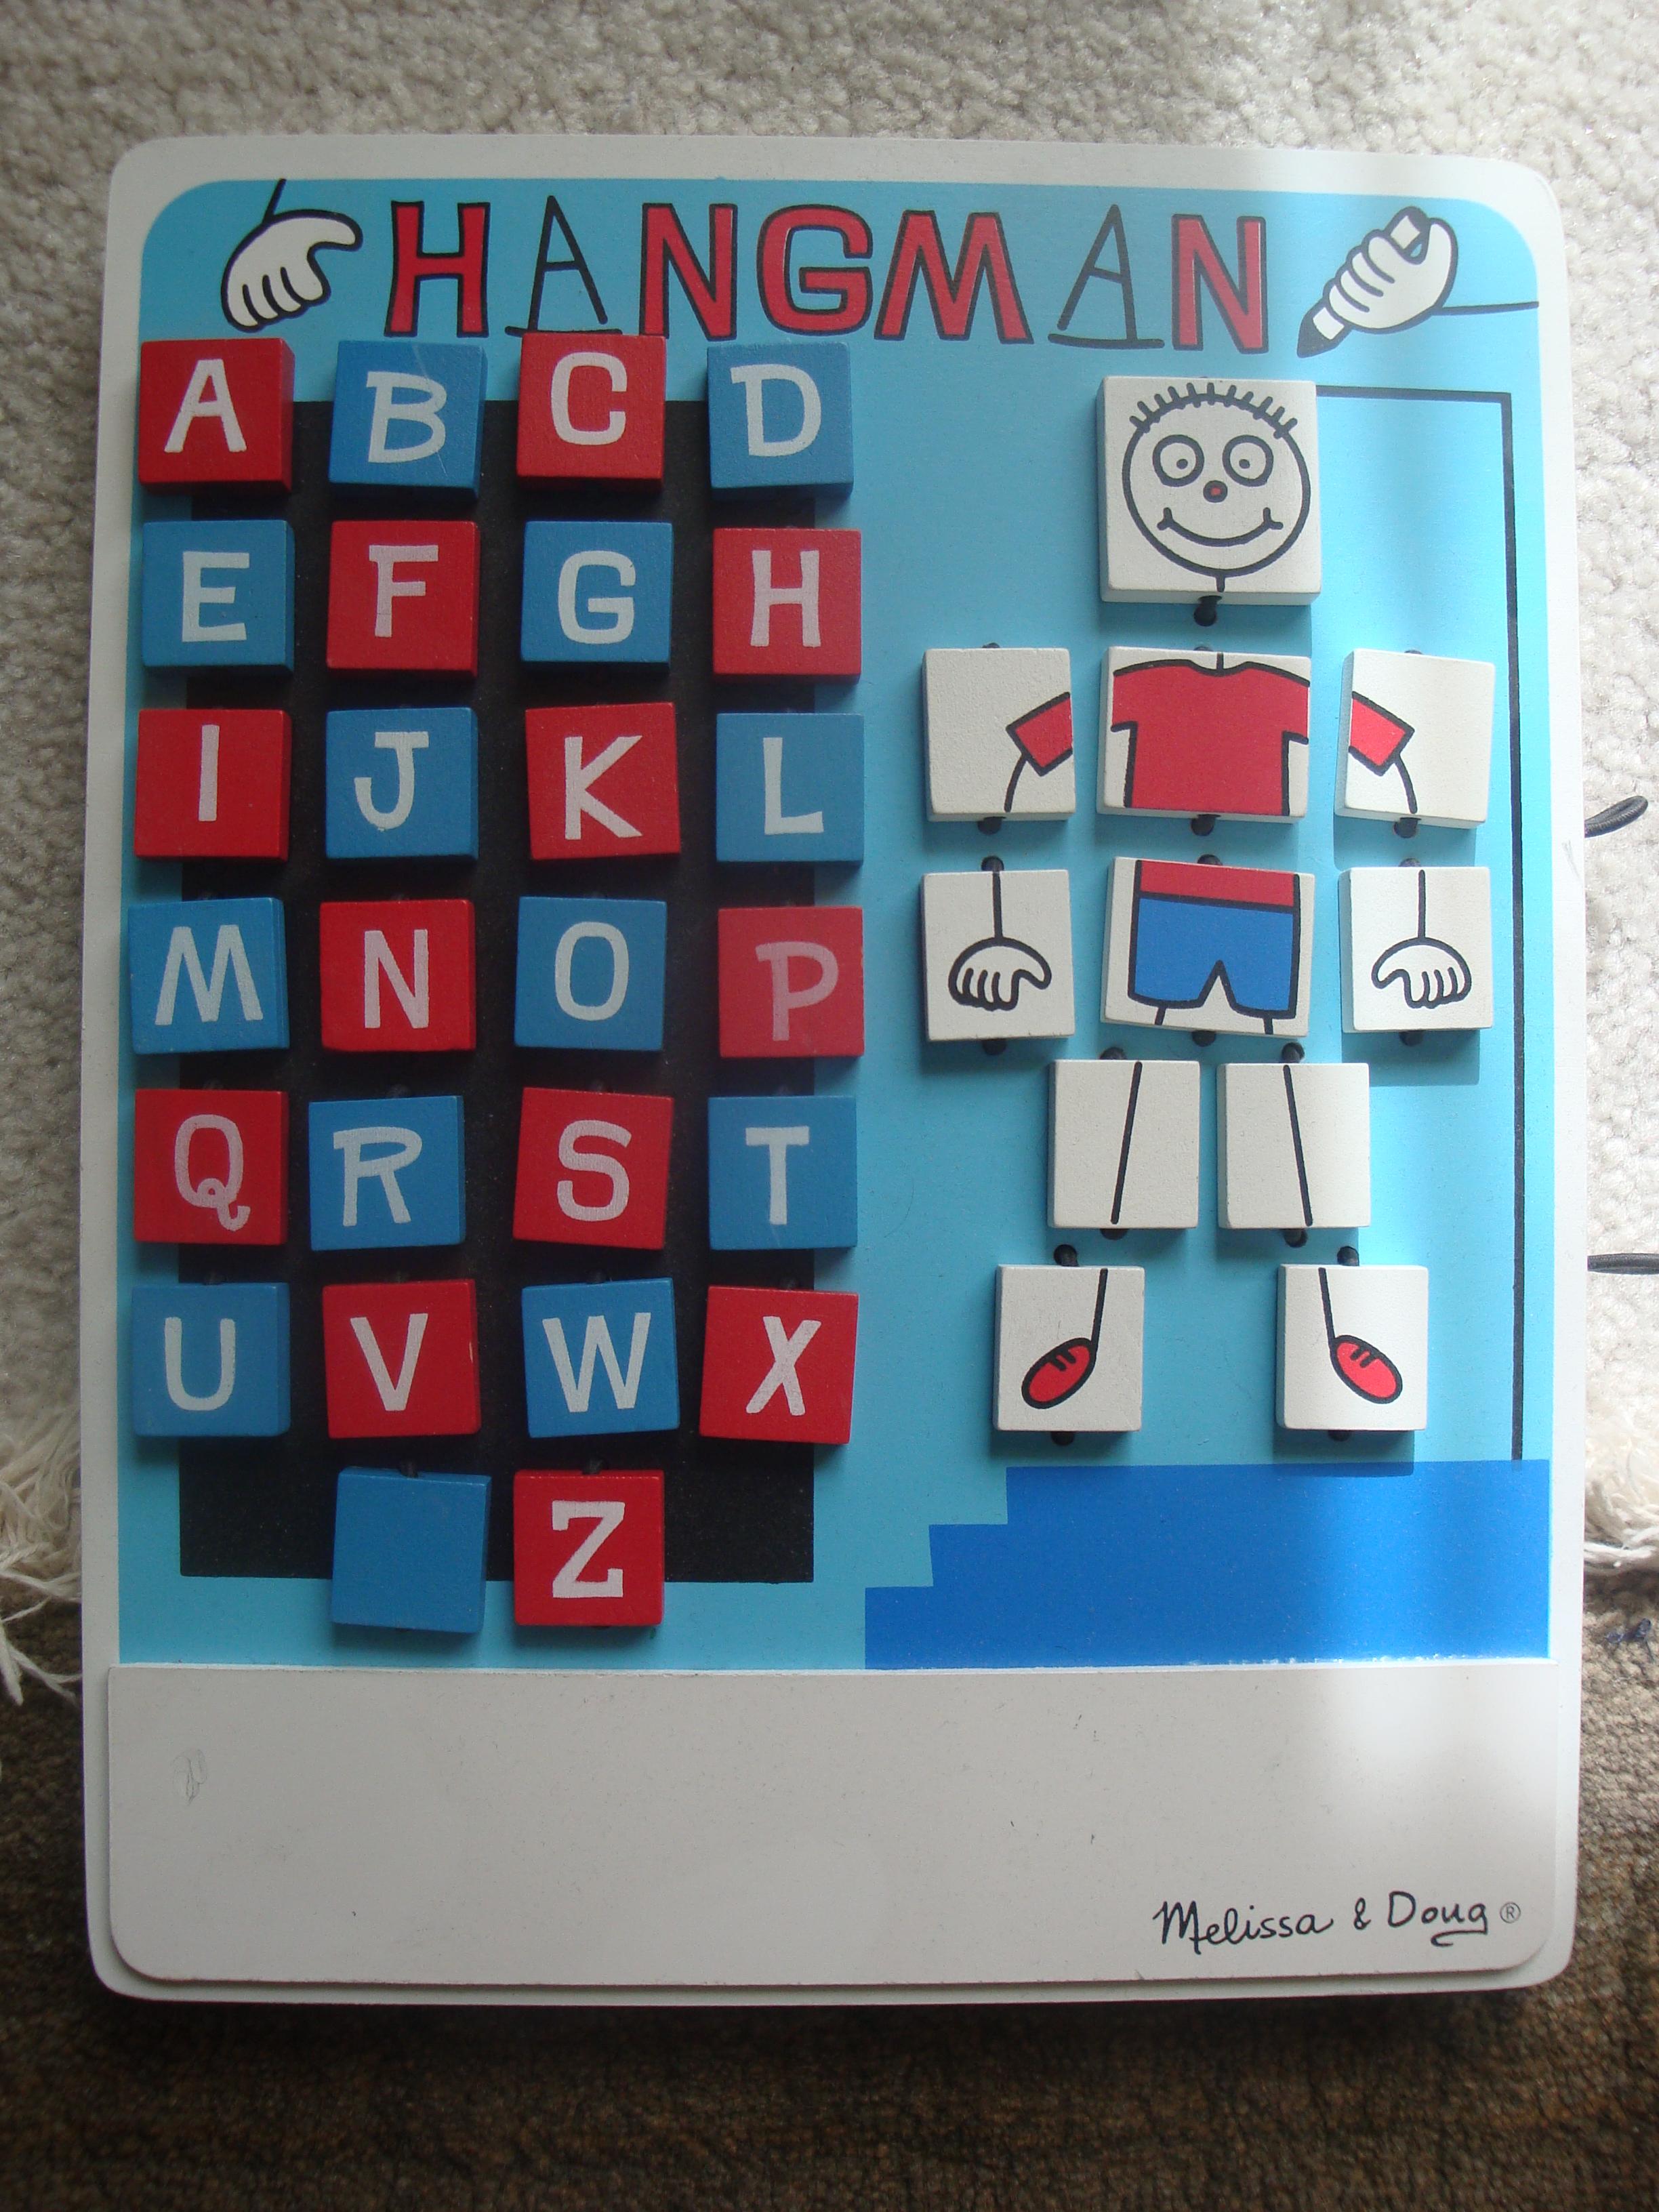 English word games for kids| LearnEnglish Kids - British ...